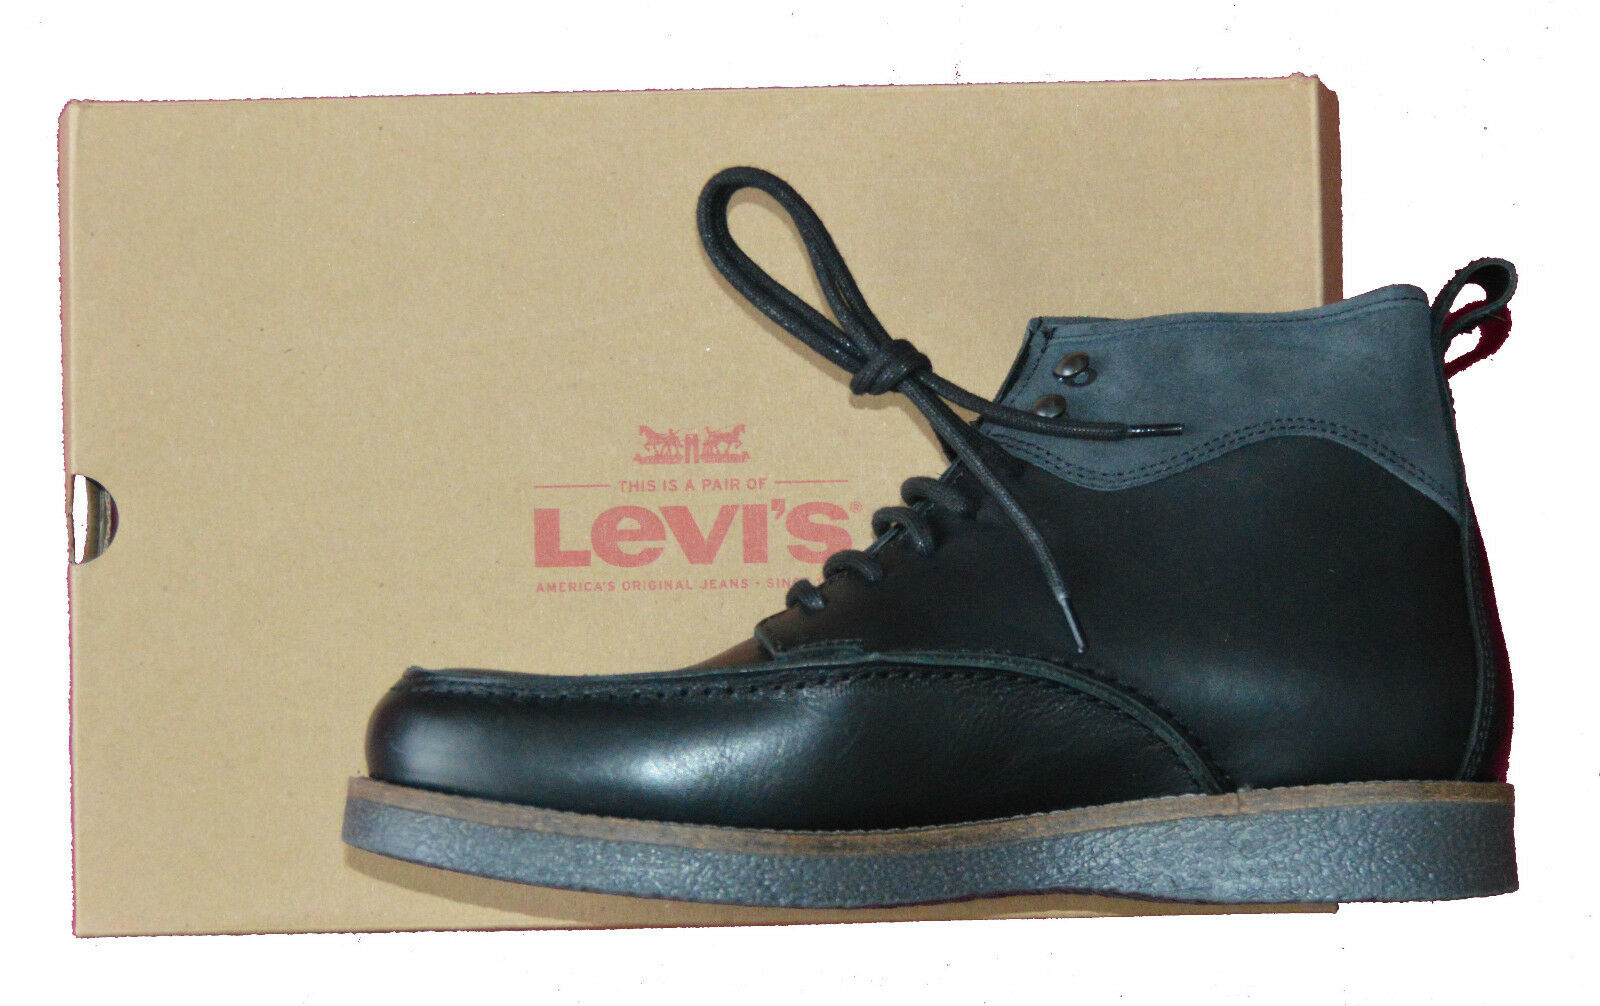 BNIB LEVI'S BLACK WORKING Stiefel ORIGINAL Größe 7.5,10. 10.5 GUARANTEED ORIGINAL Stiefel 232c2e